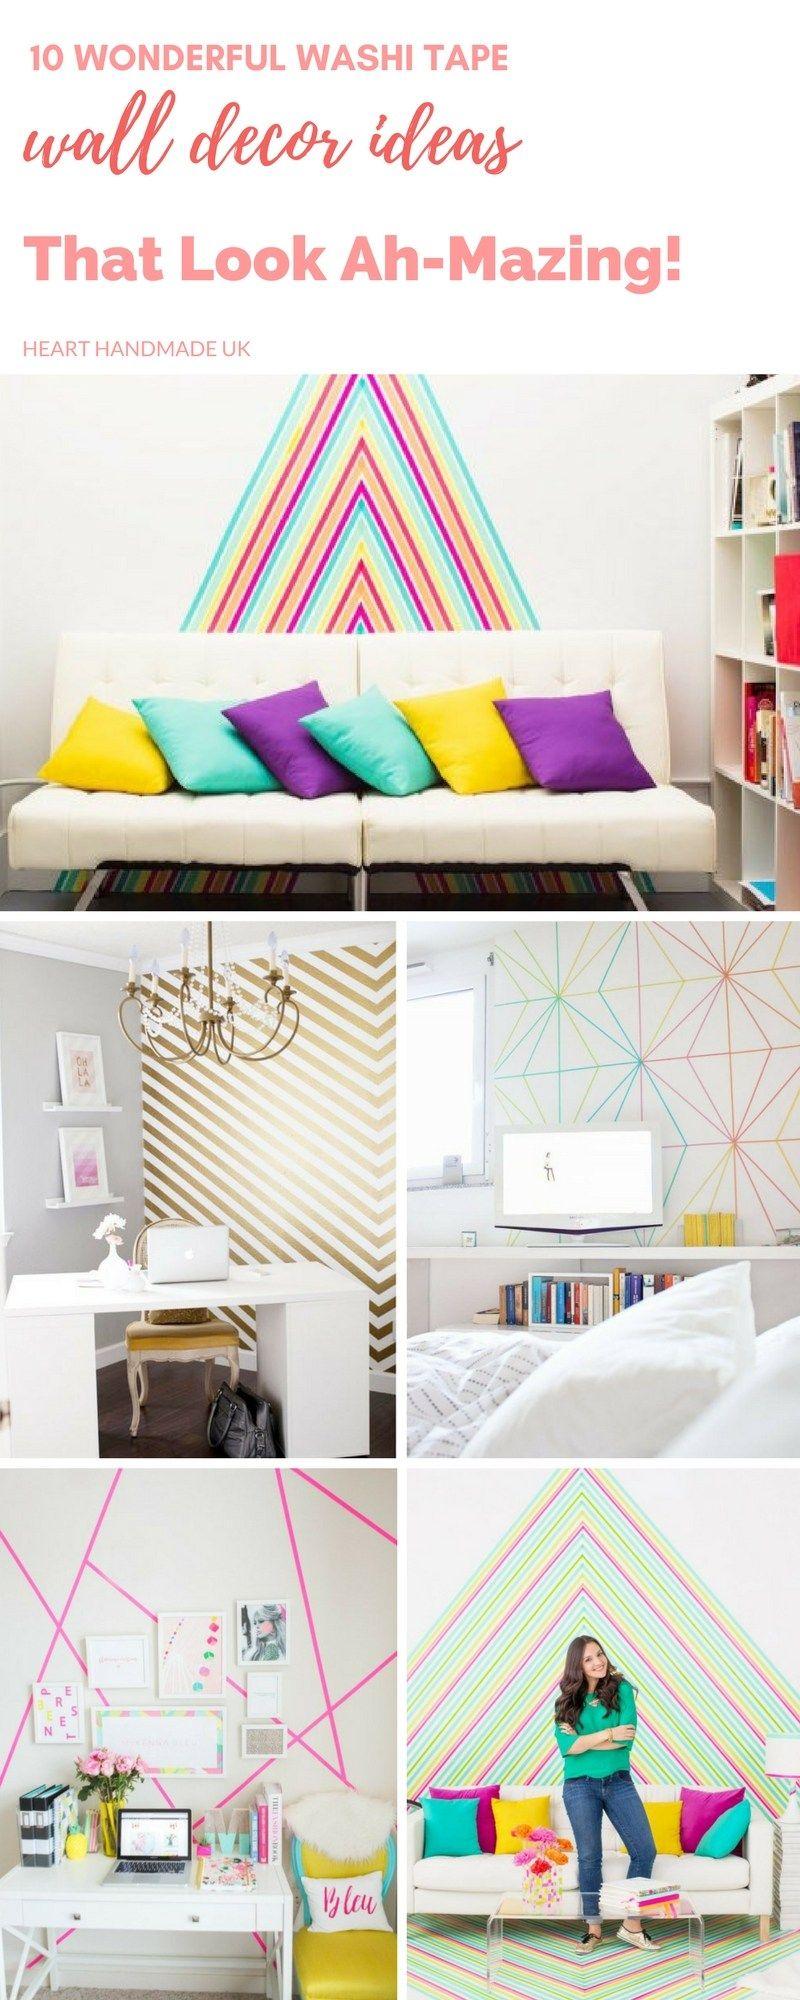 10 Wonderful Washi Tape Wall Decor Ideas That Look Amazing